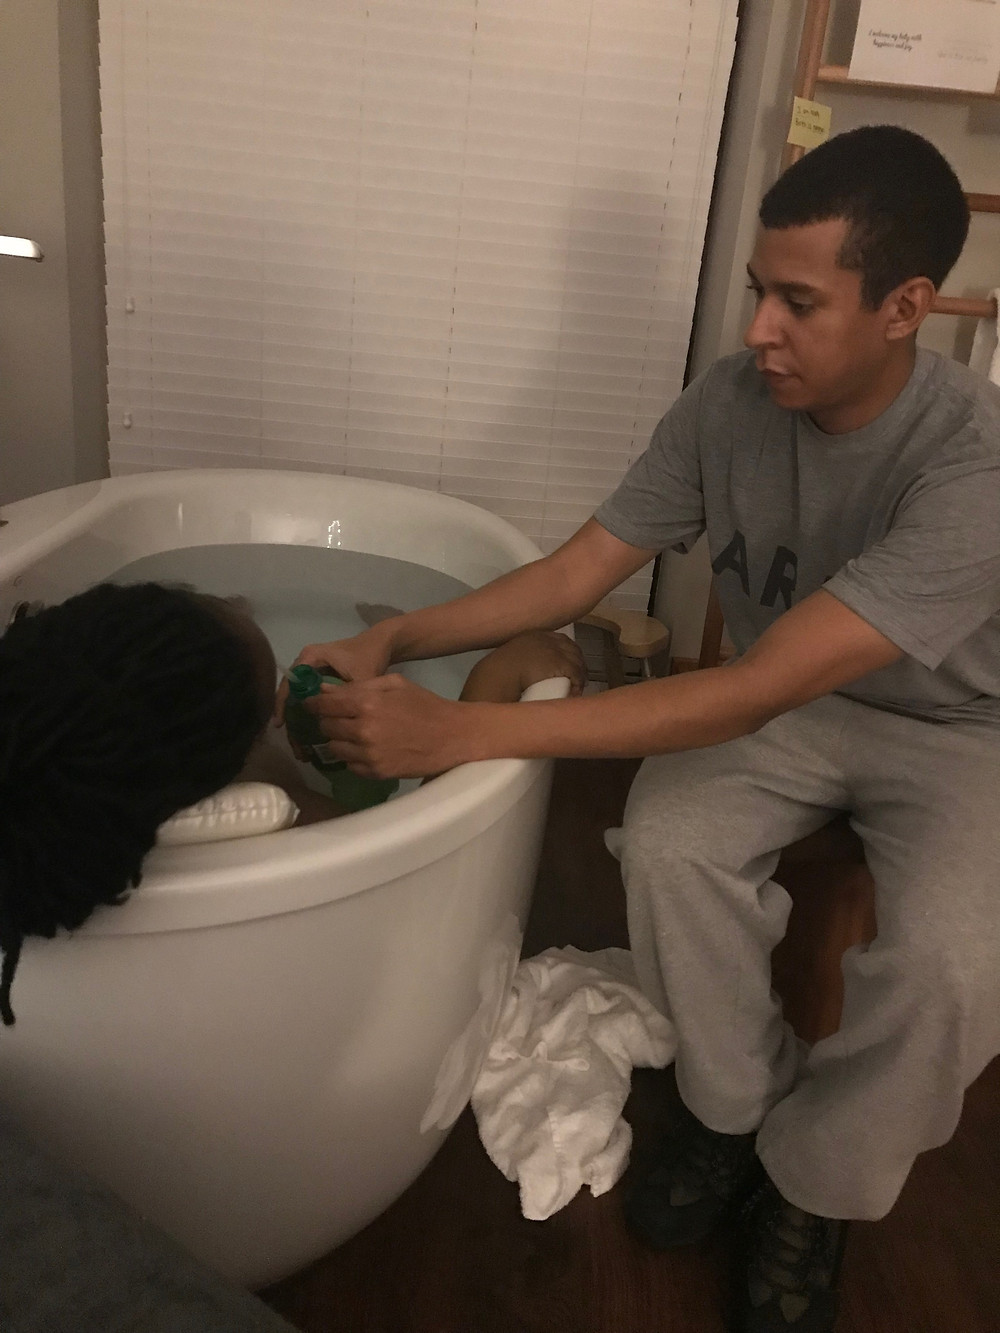 Labor in the Tub